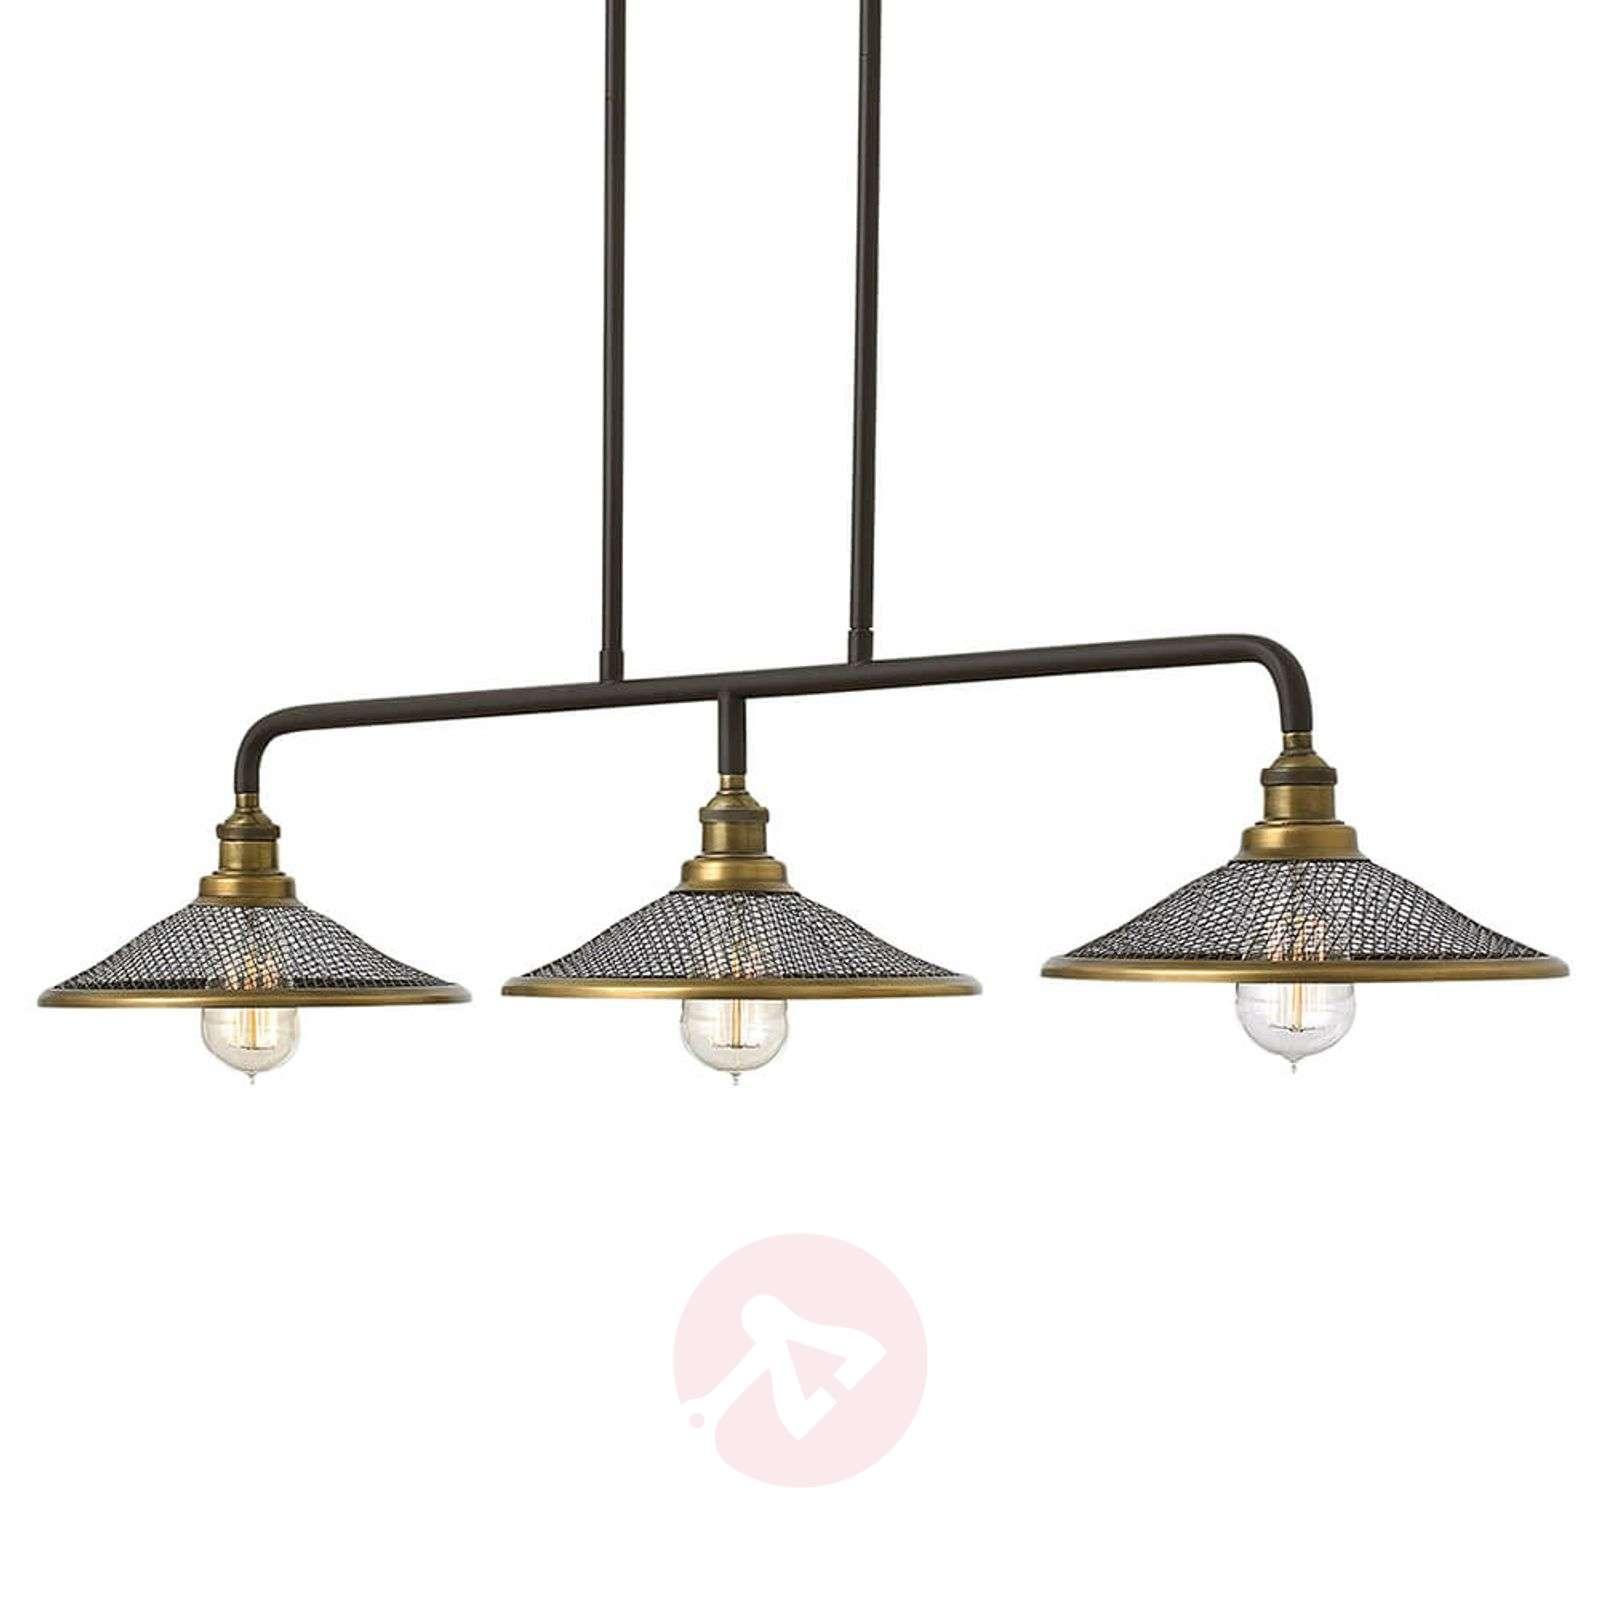 Pendant lamp Rigby, extensive light, three-bulb-3048781-01